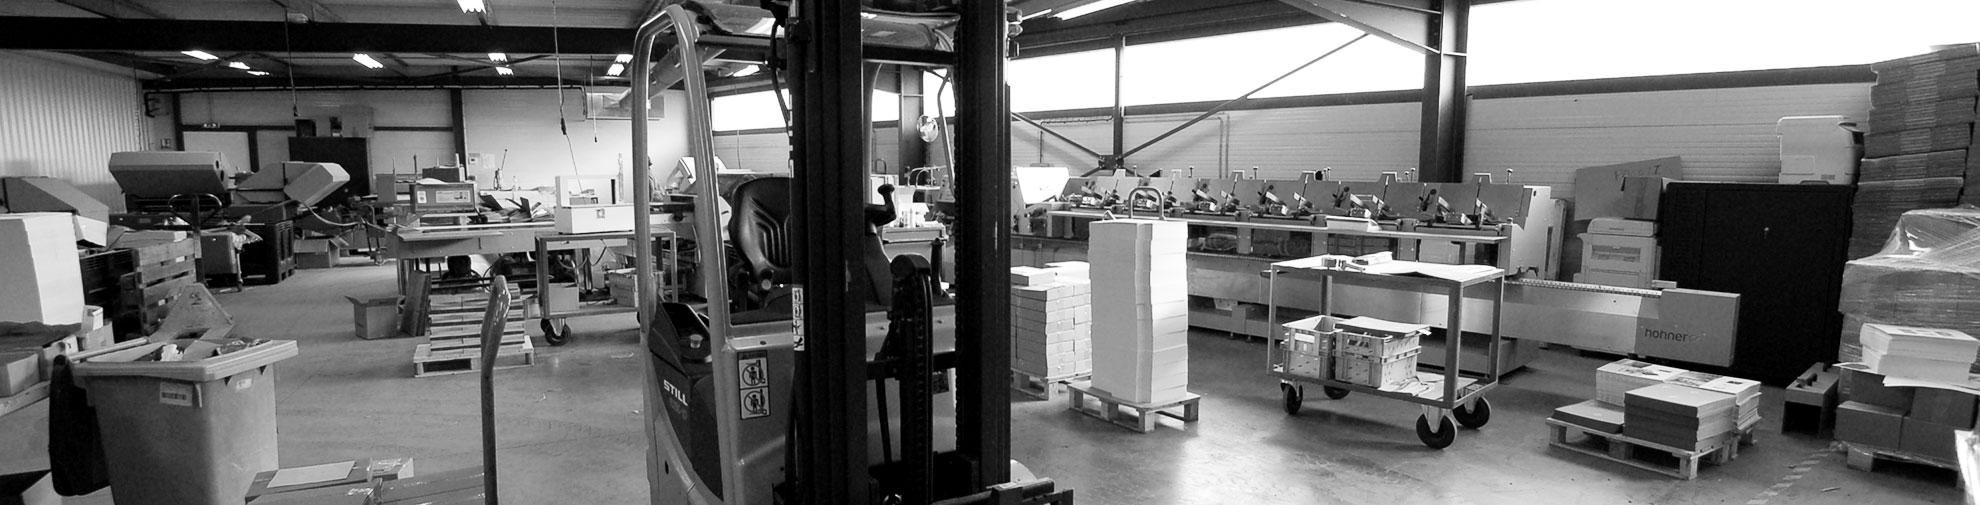 Imprimerie SODAL - L'atelier